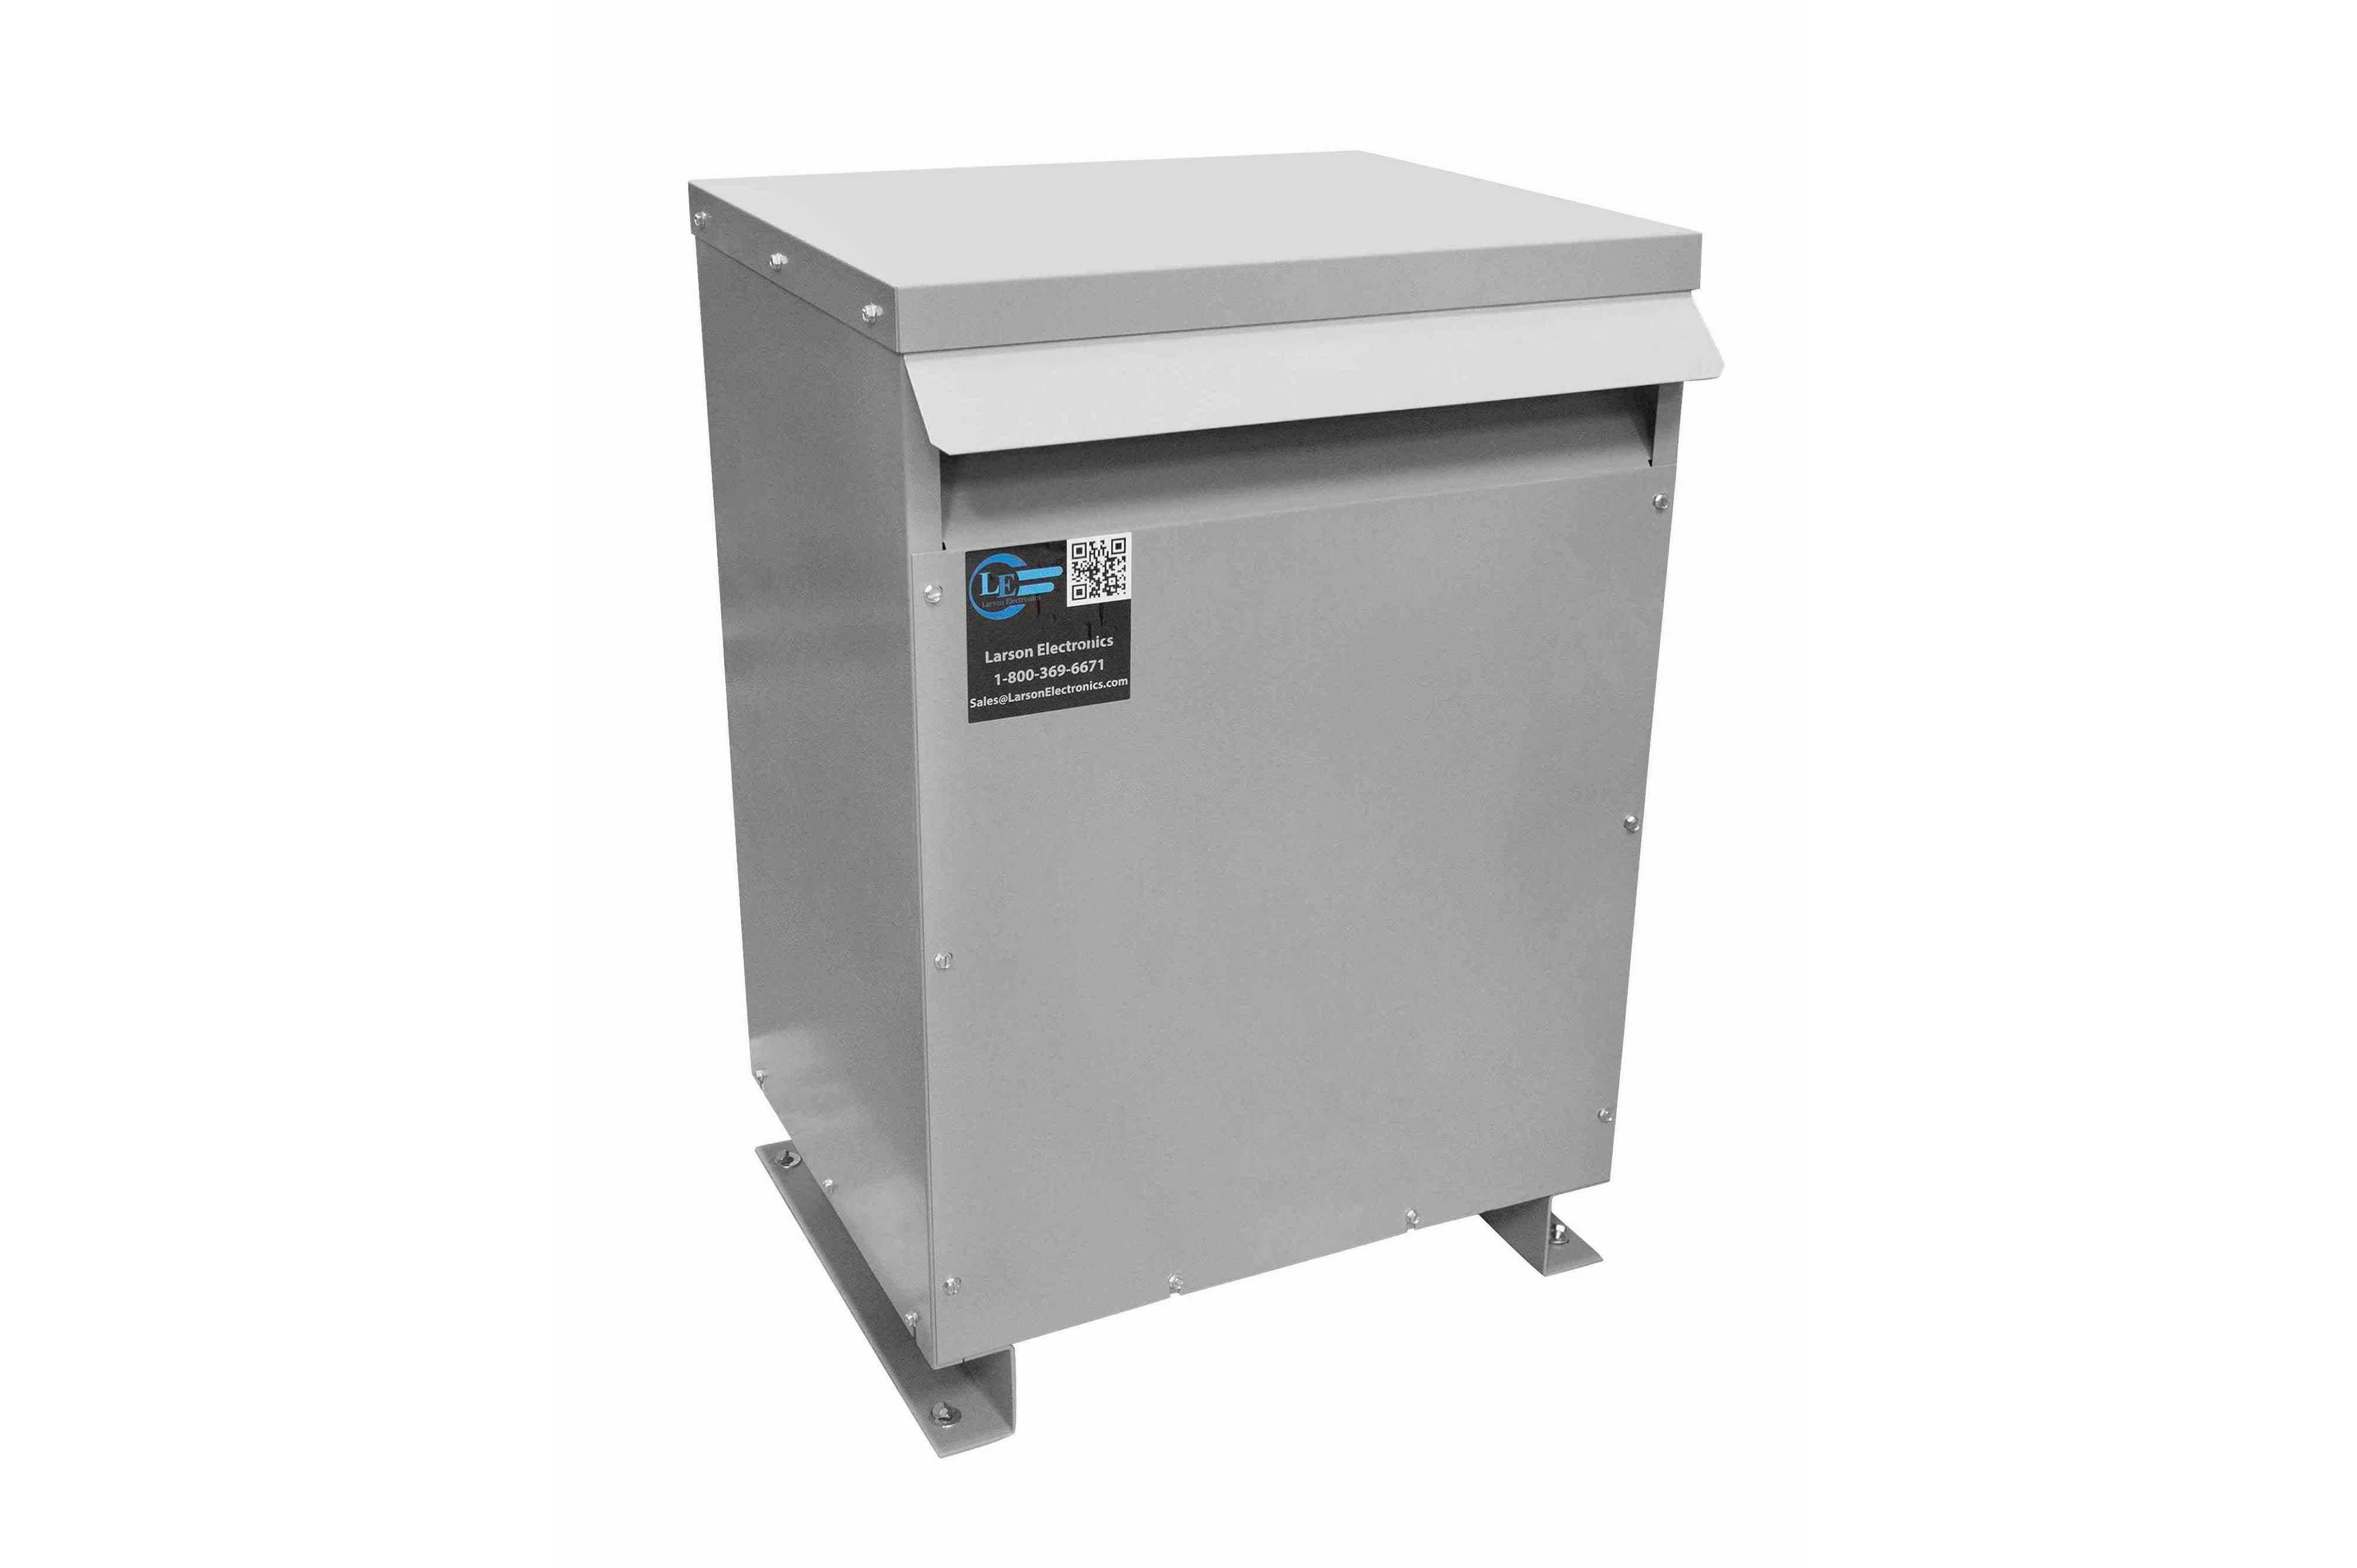 22.5 kVA 3PH Isolation Transformer, 230V Wye Primary, 208V Delta Secondary, N3R, Ventilated, 60 Hz